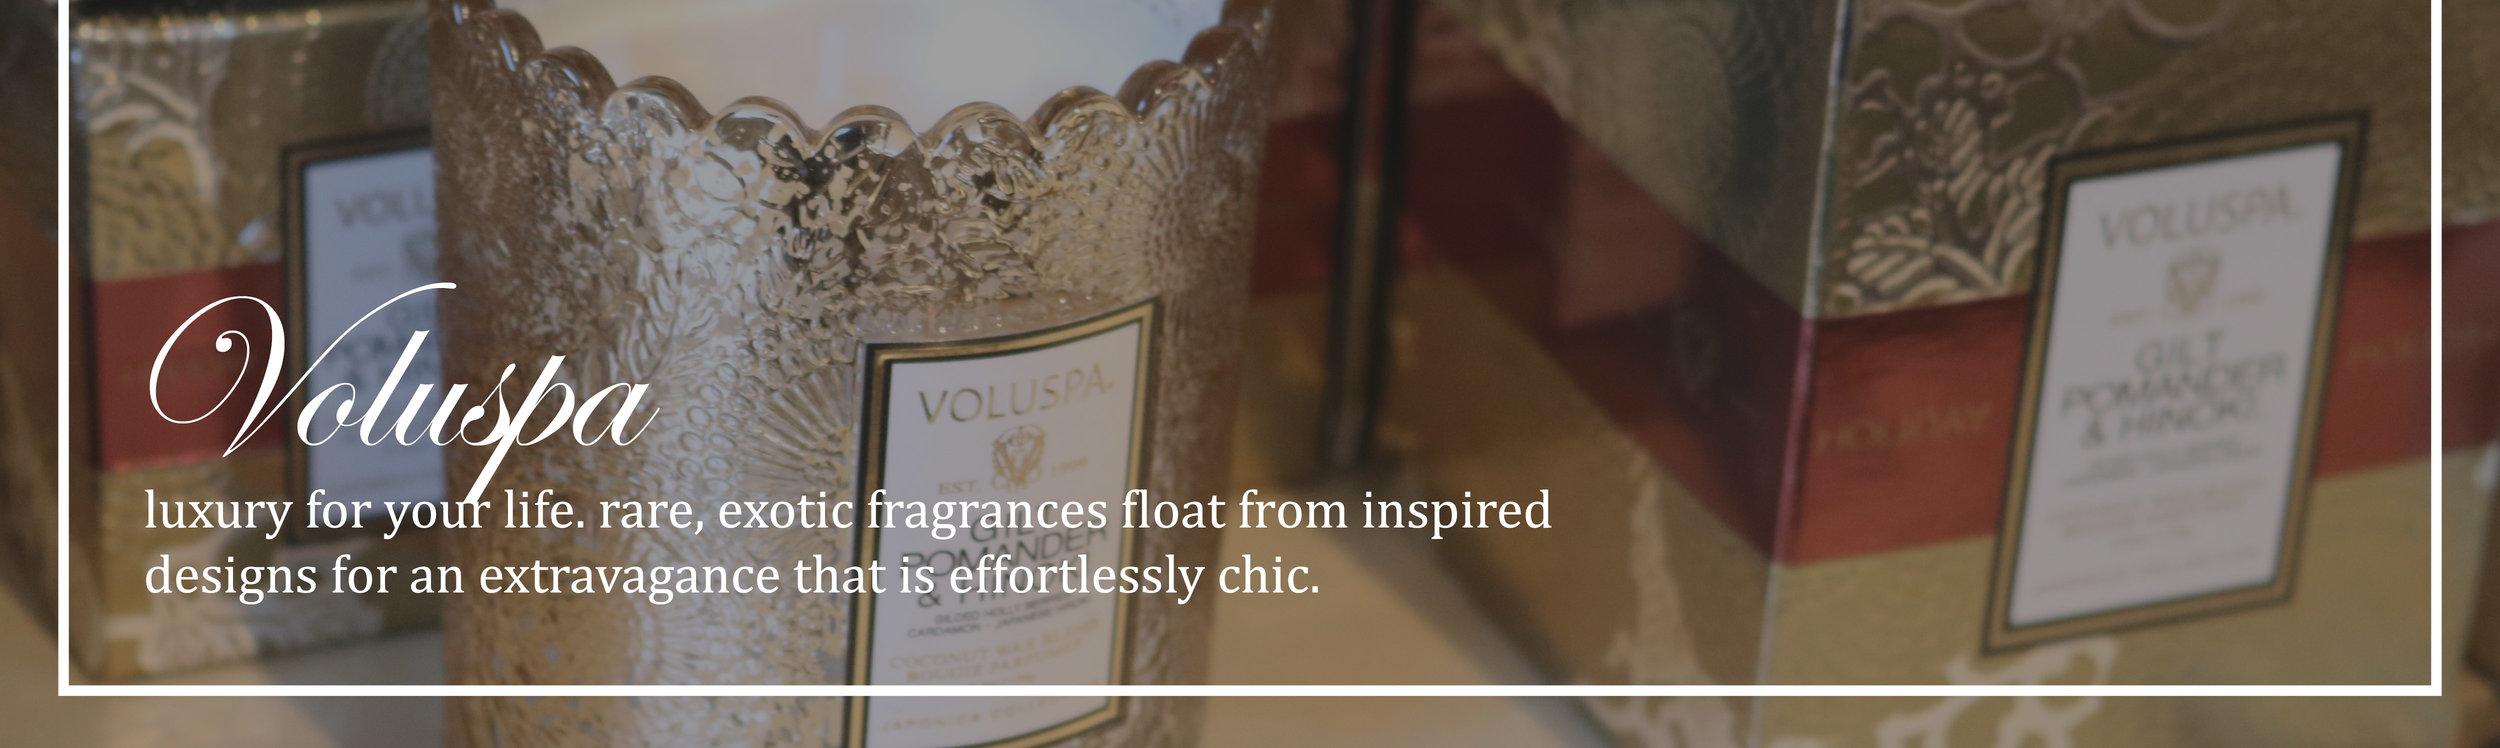 Voluspa Luxury Candles & Fragrance